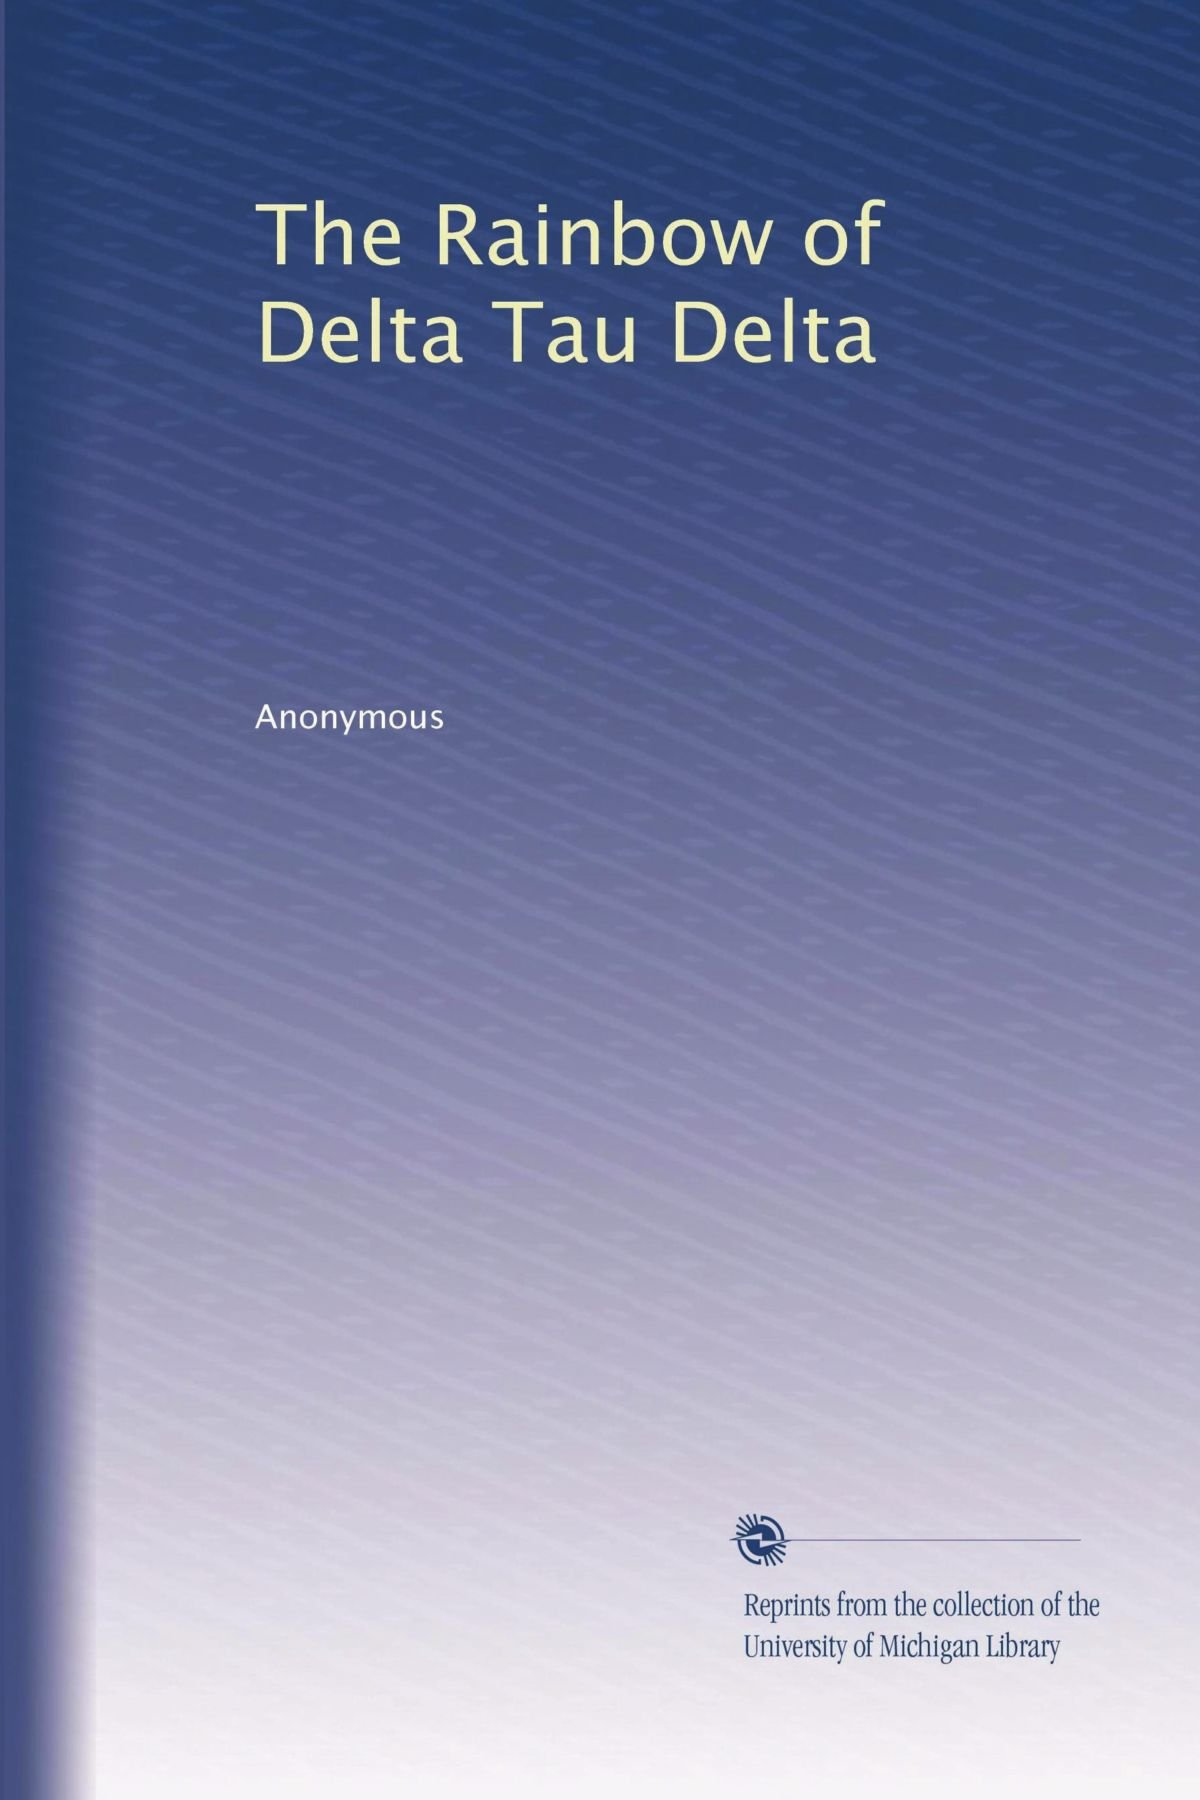 Download The Rainbow of Delta Tau Delta PDF